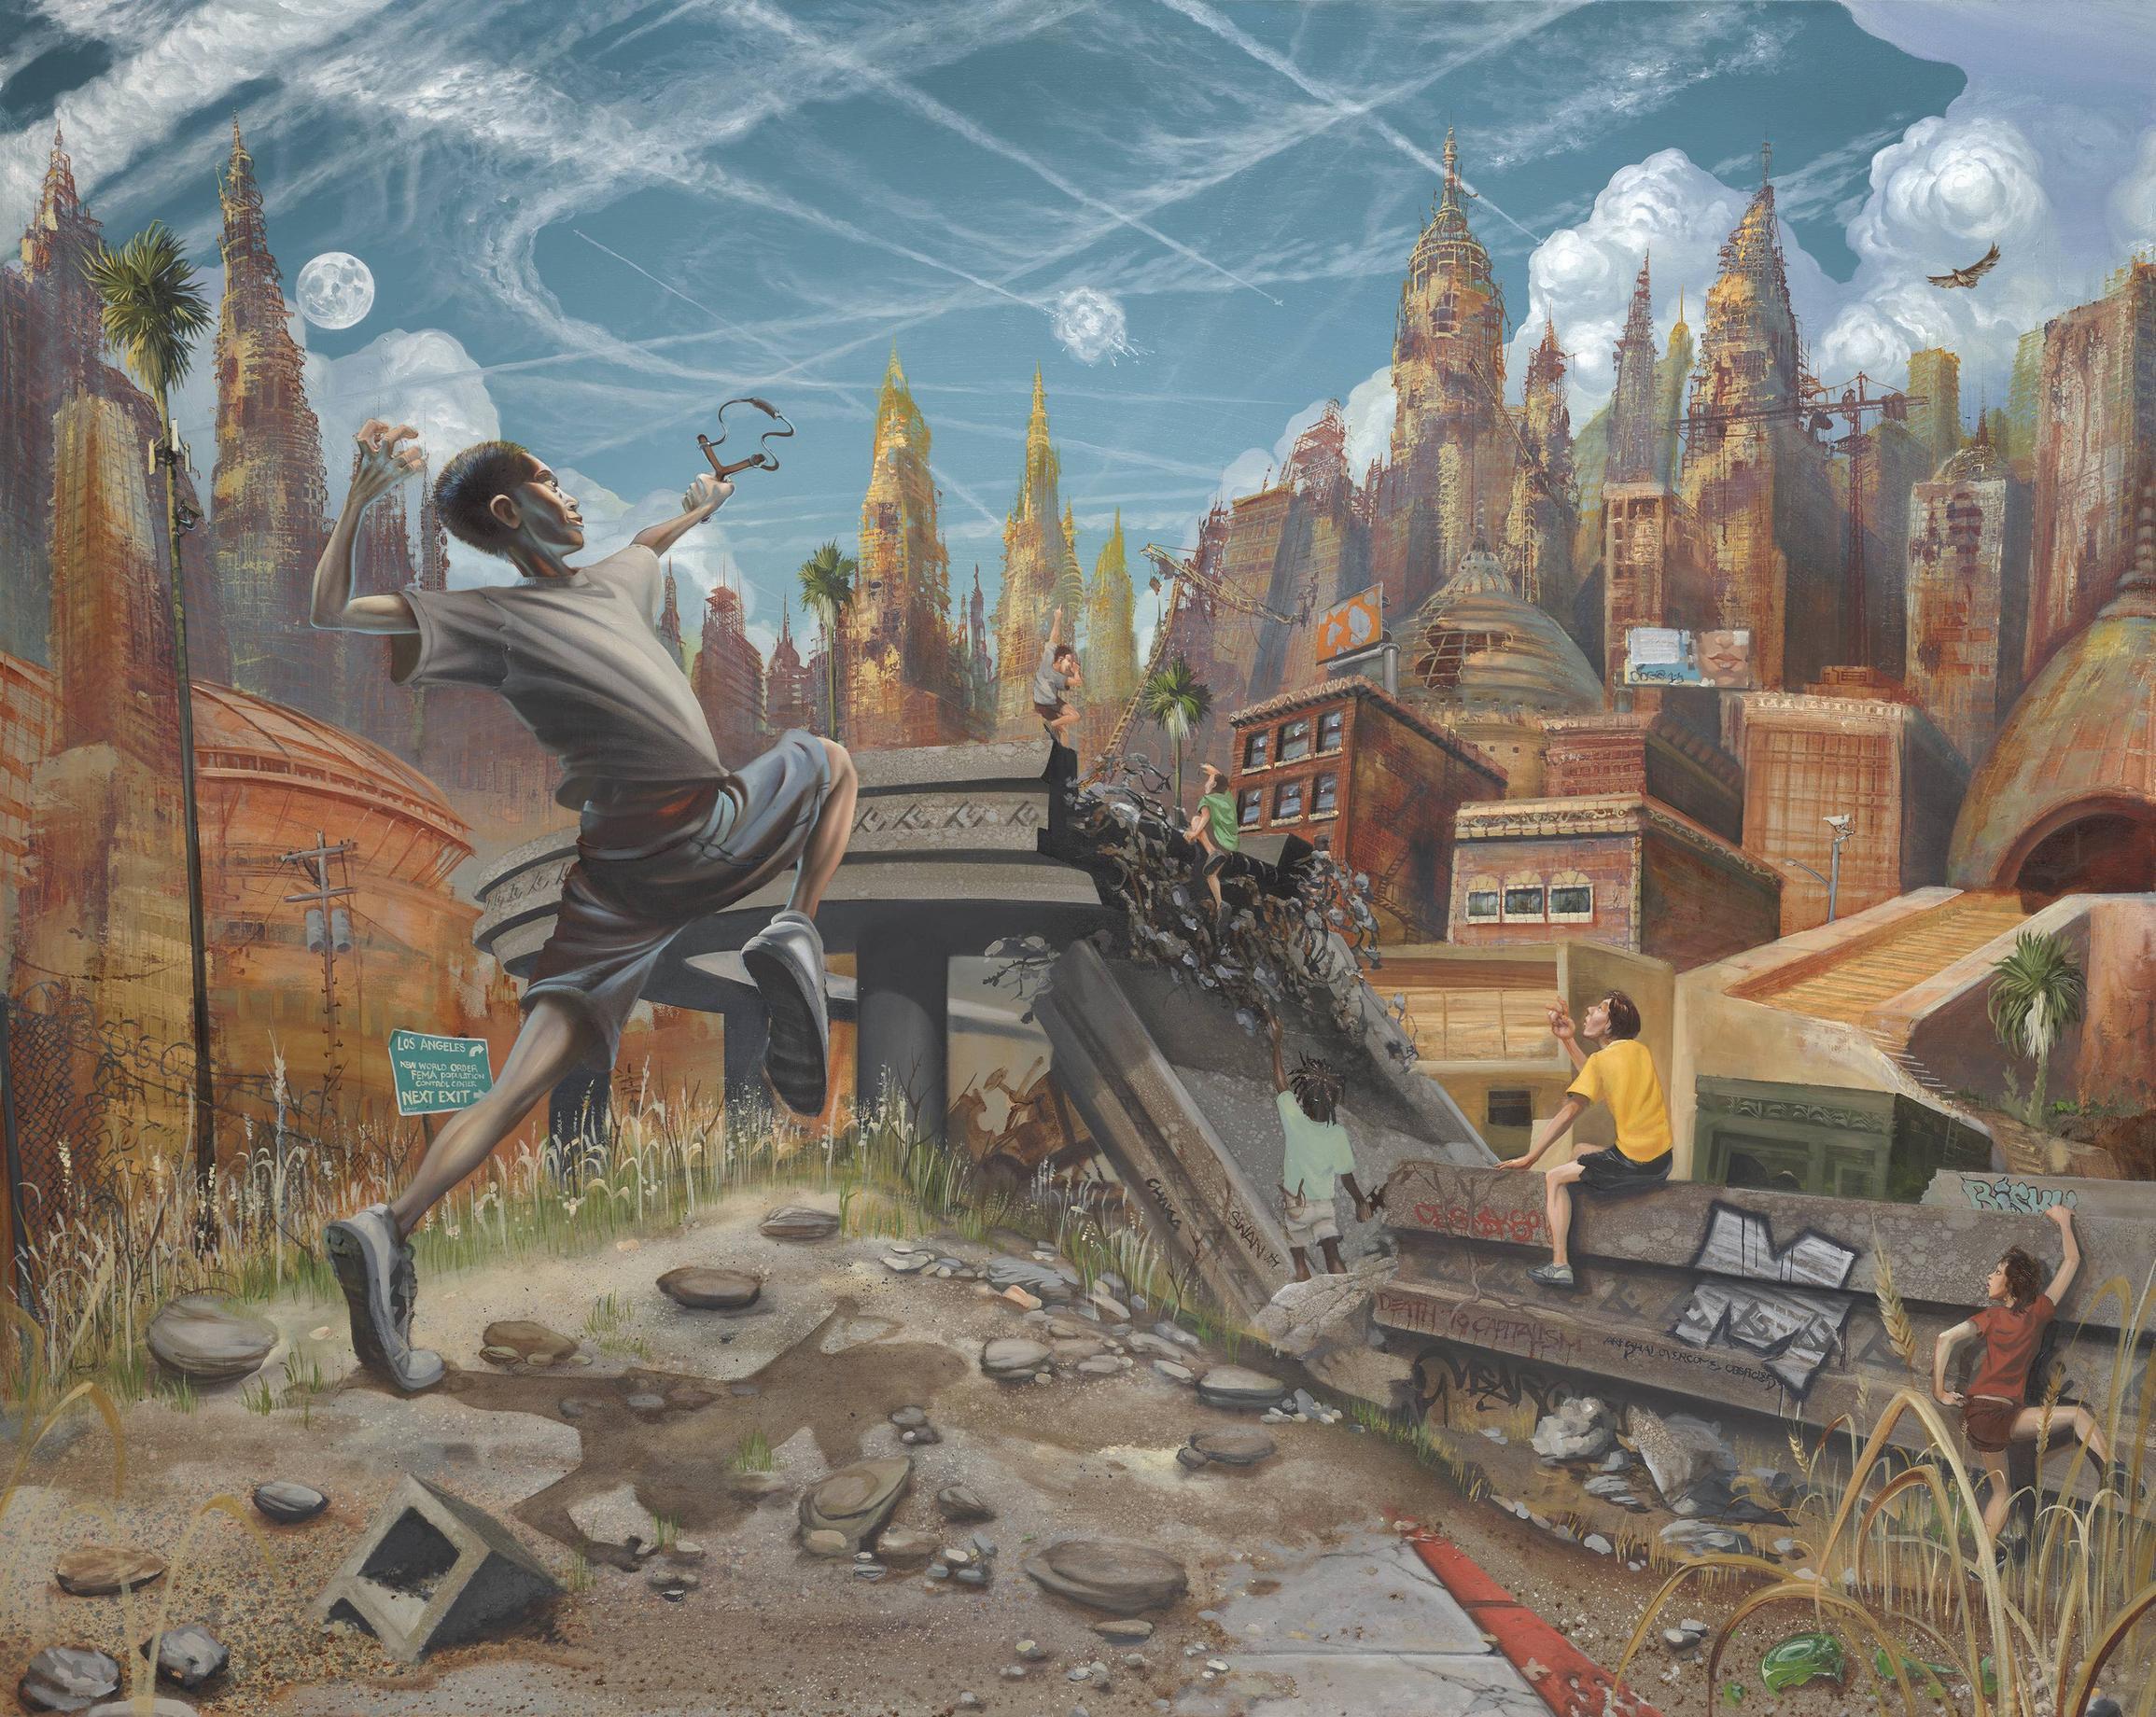 Freeport - David & Goliath 51/100